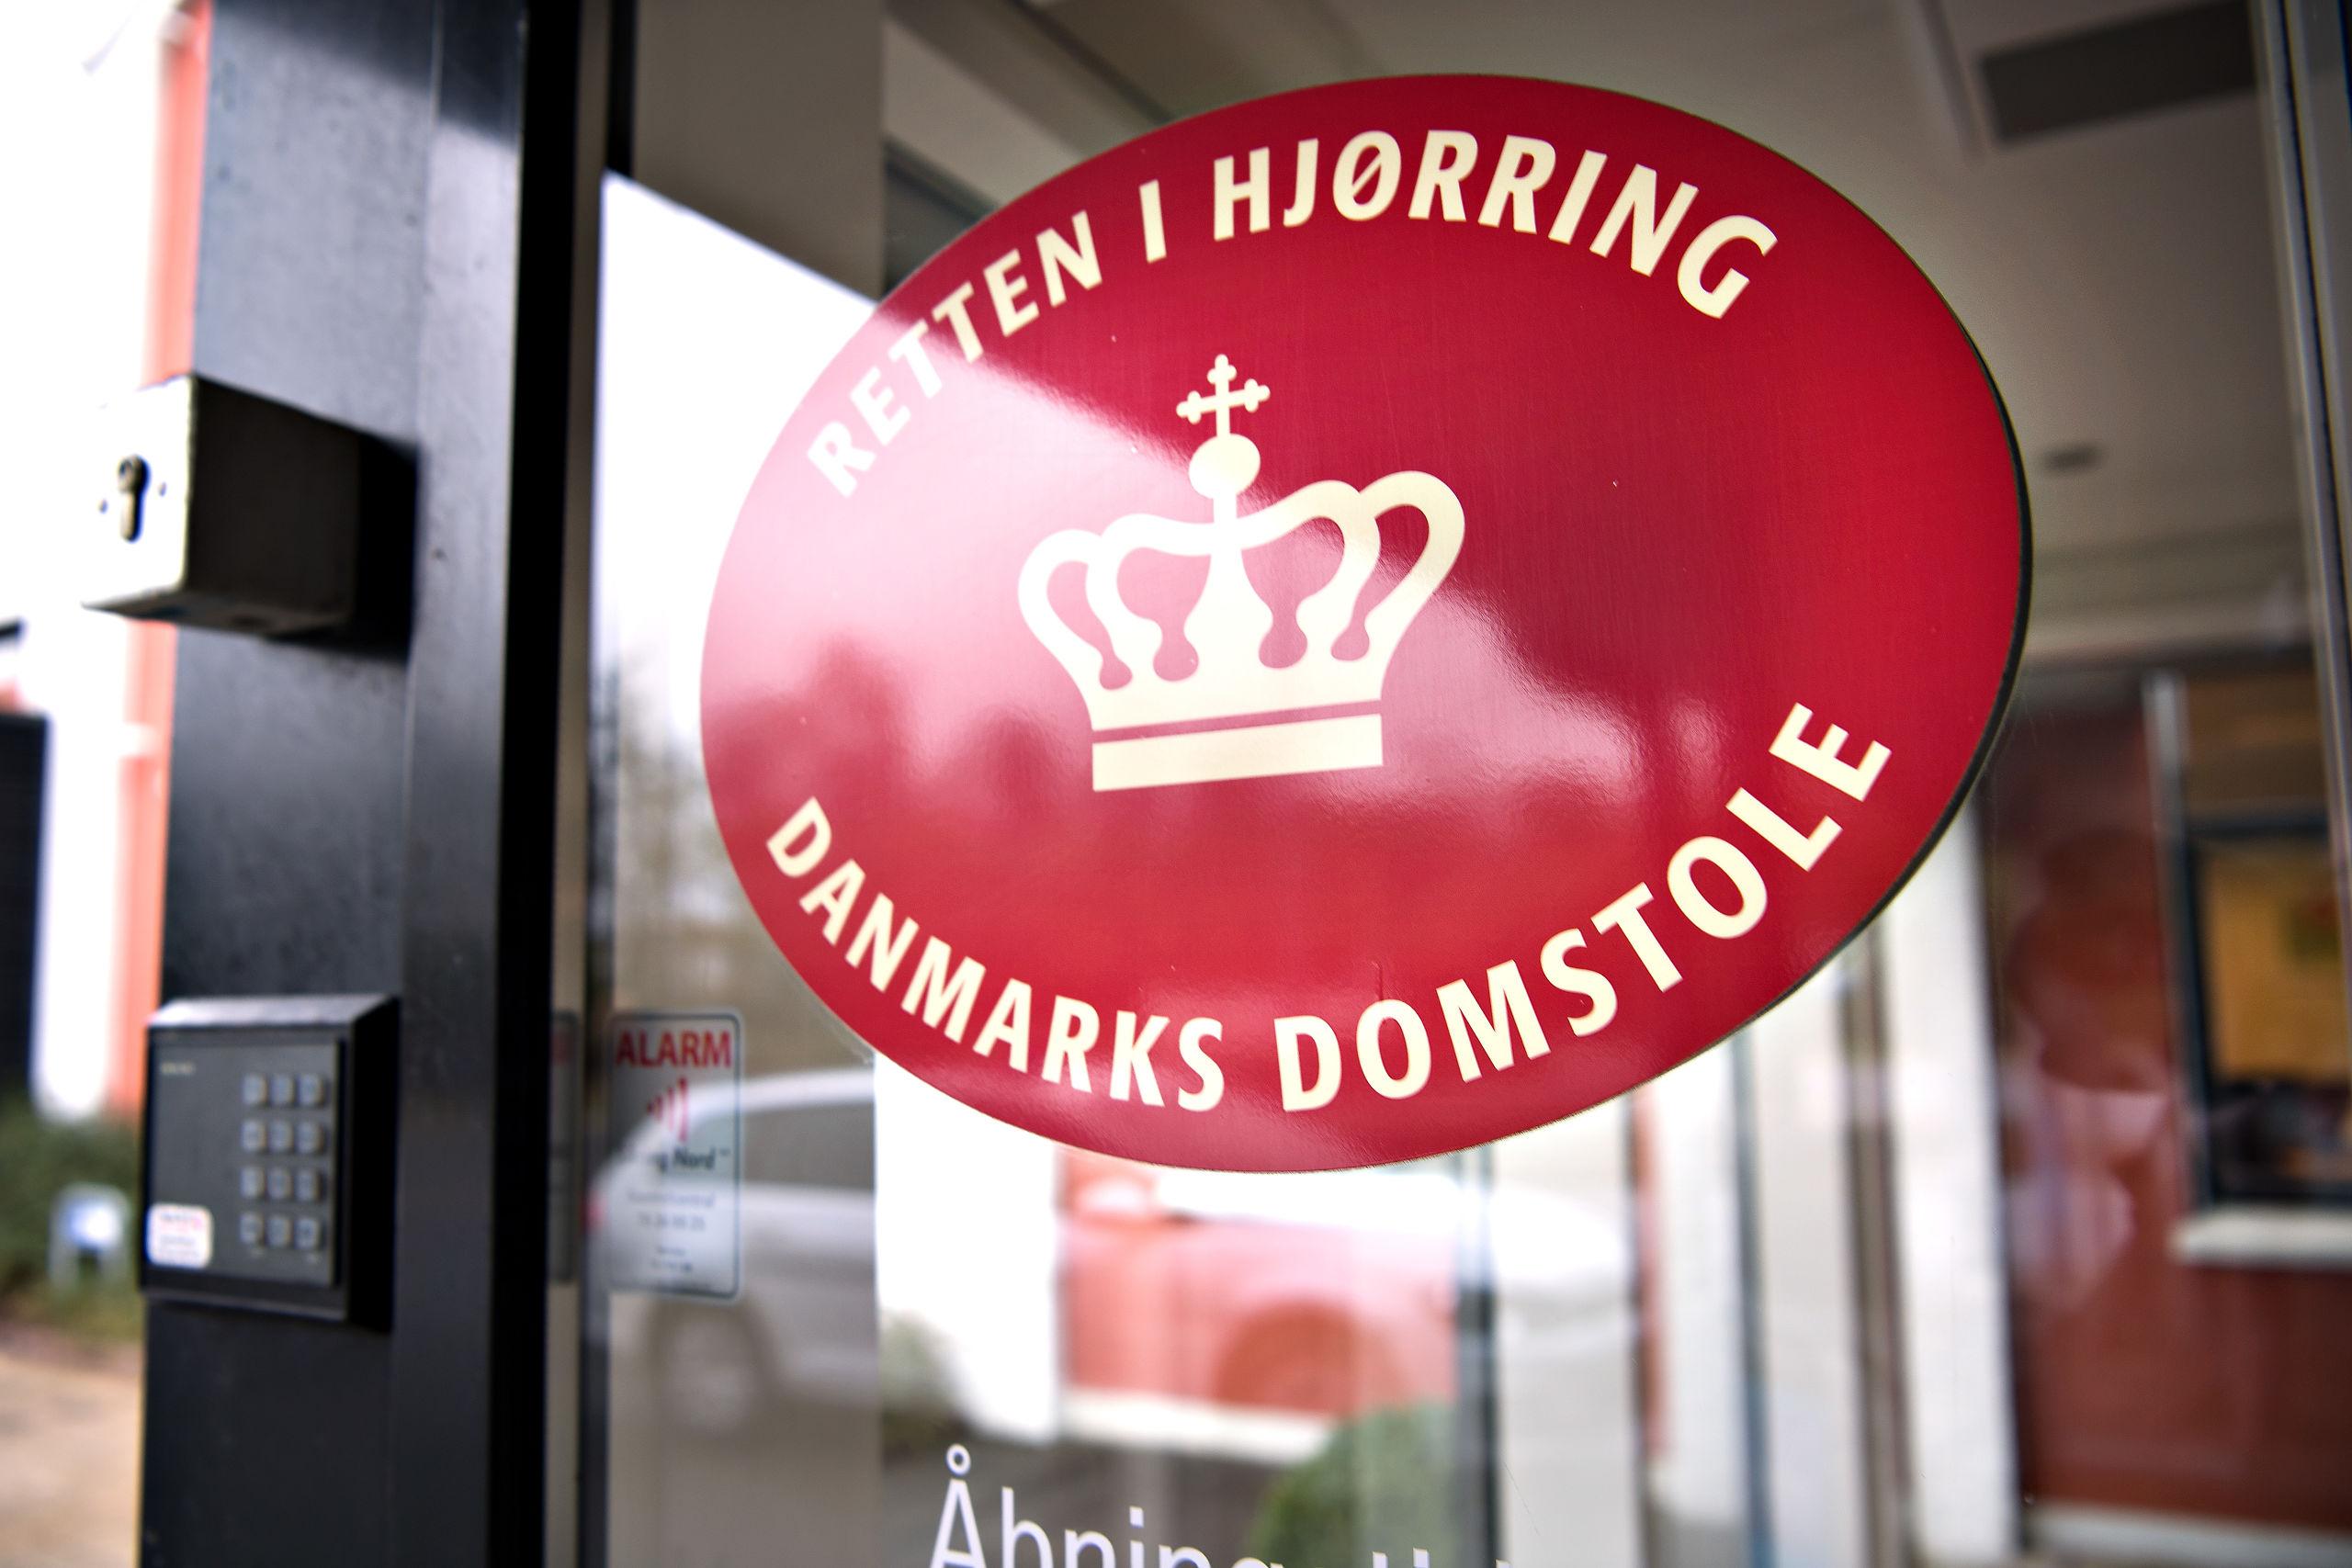 Hemmeligt forlig: Stort nordjysk konkursbo får millioner retur